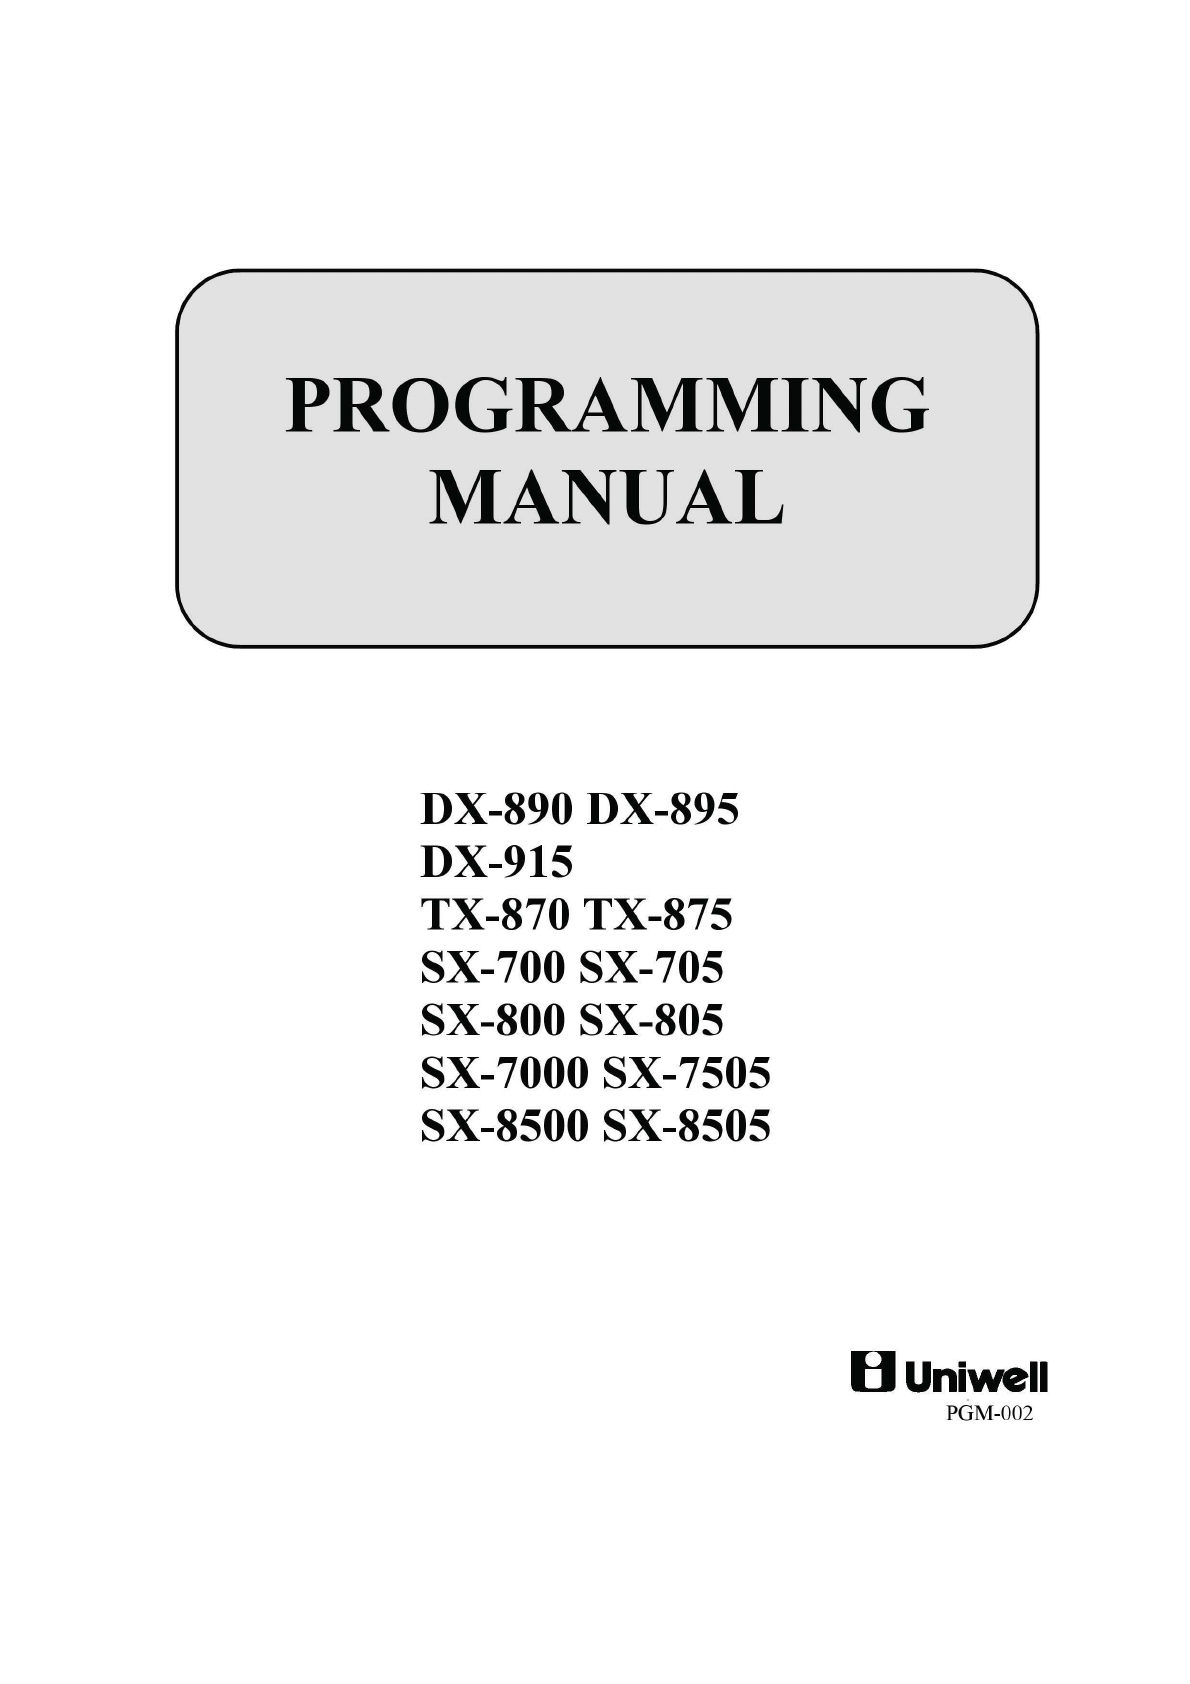 Uniwell dx-890 dx-895 dx-915 tx-870 tx-875 sx-700 sx-705 sx-800 sx.